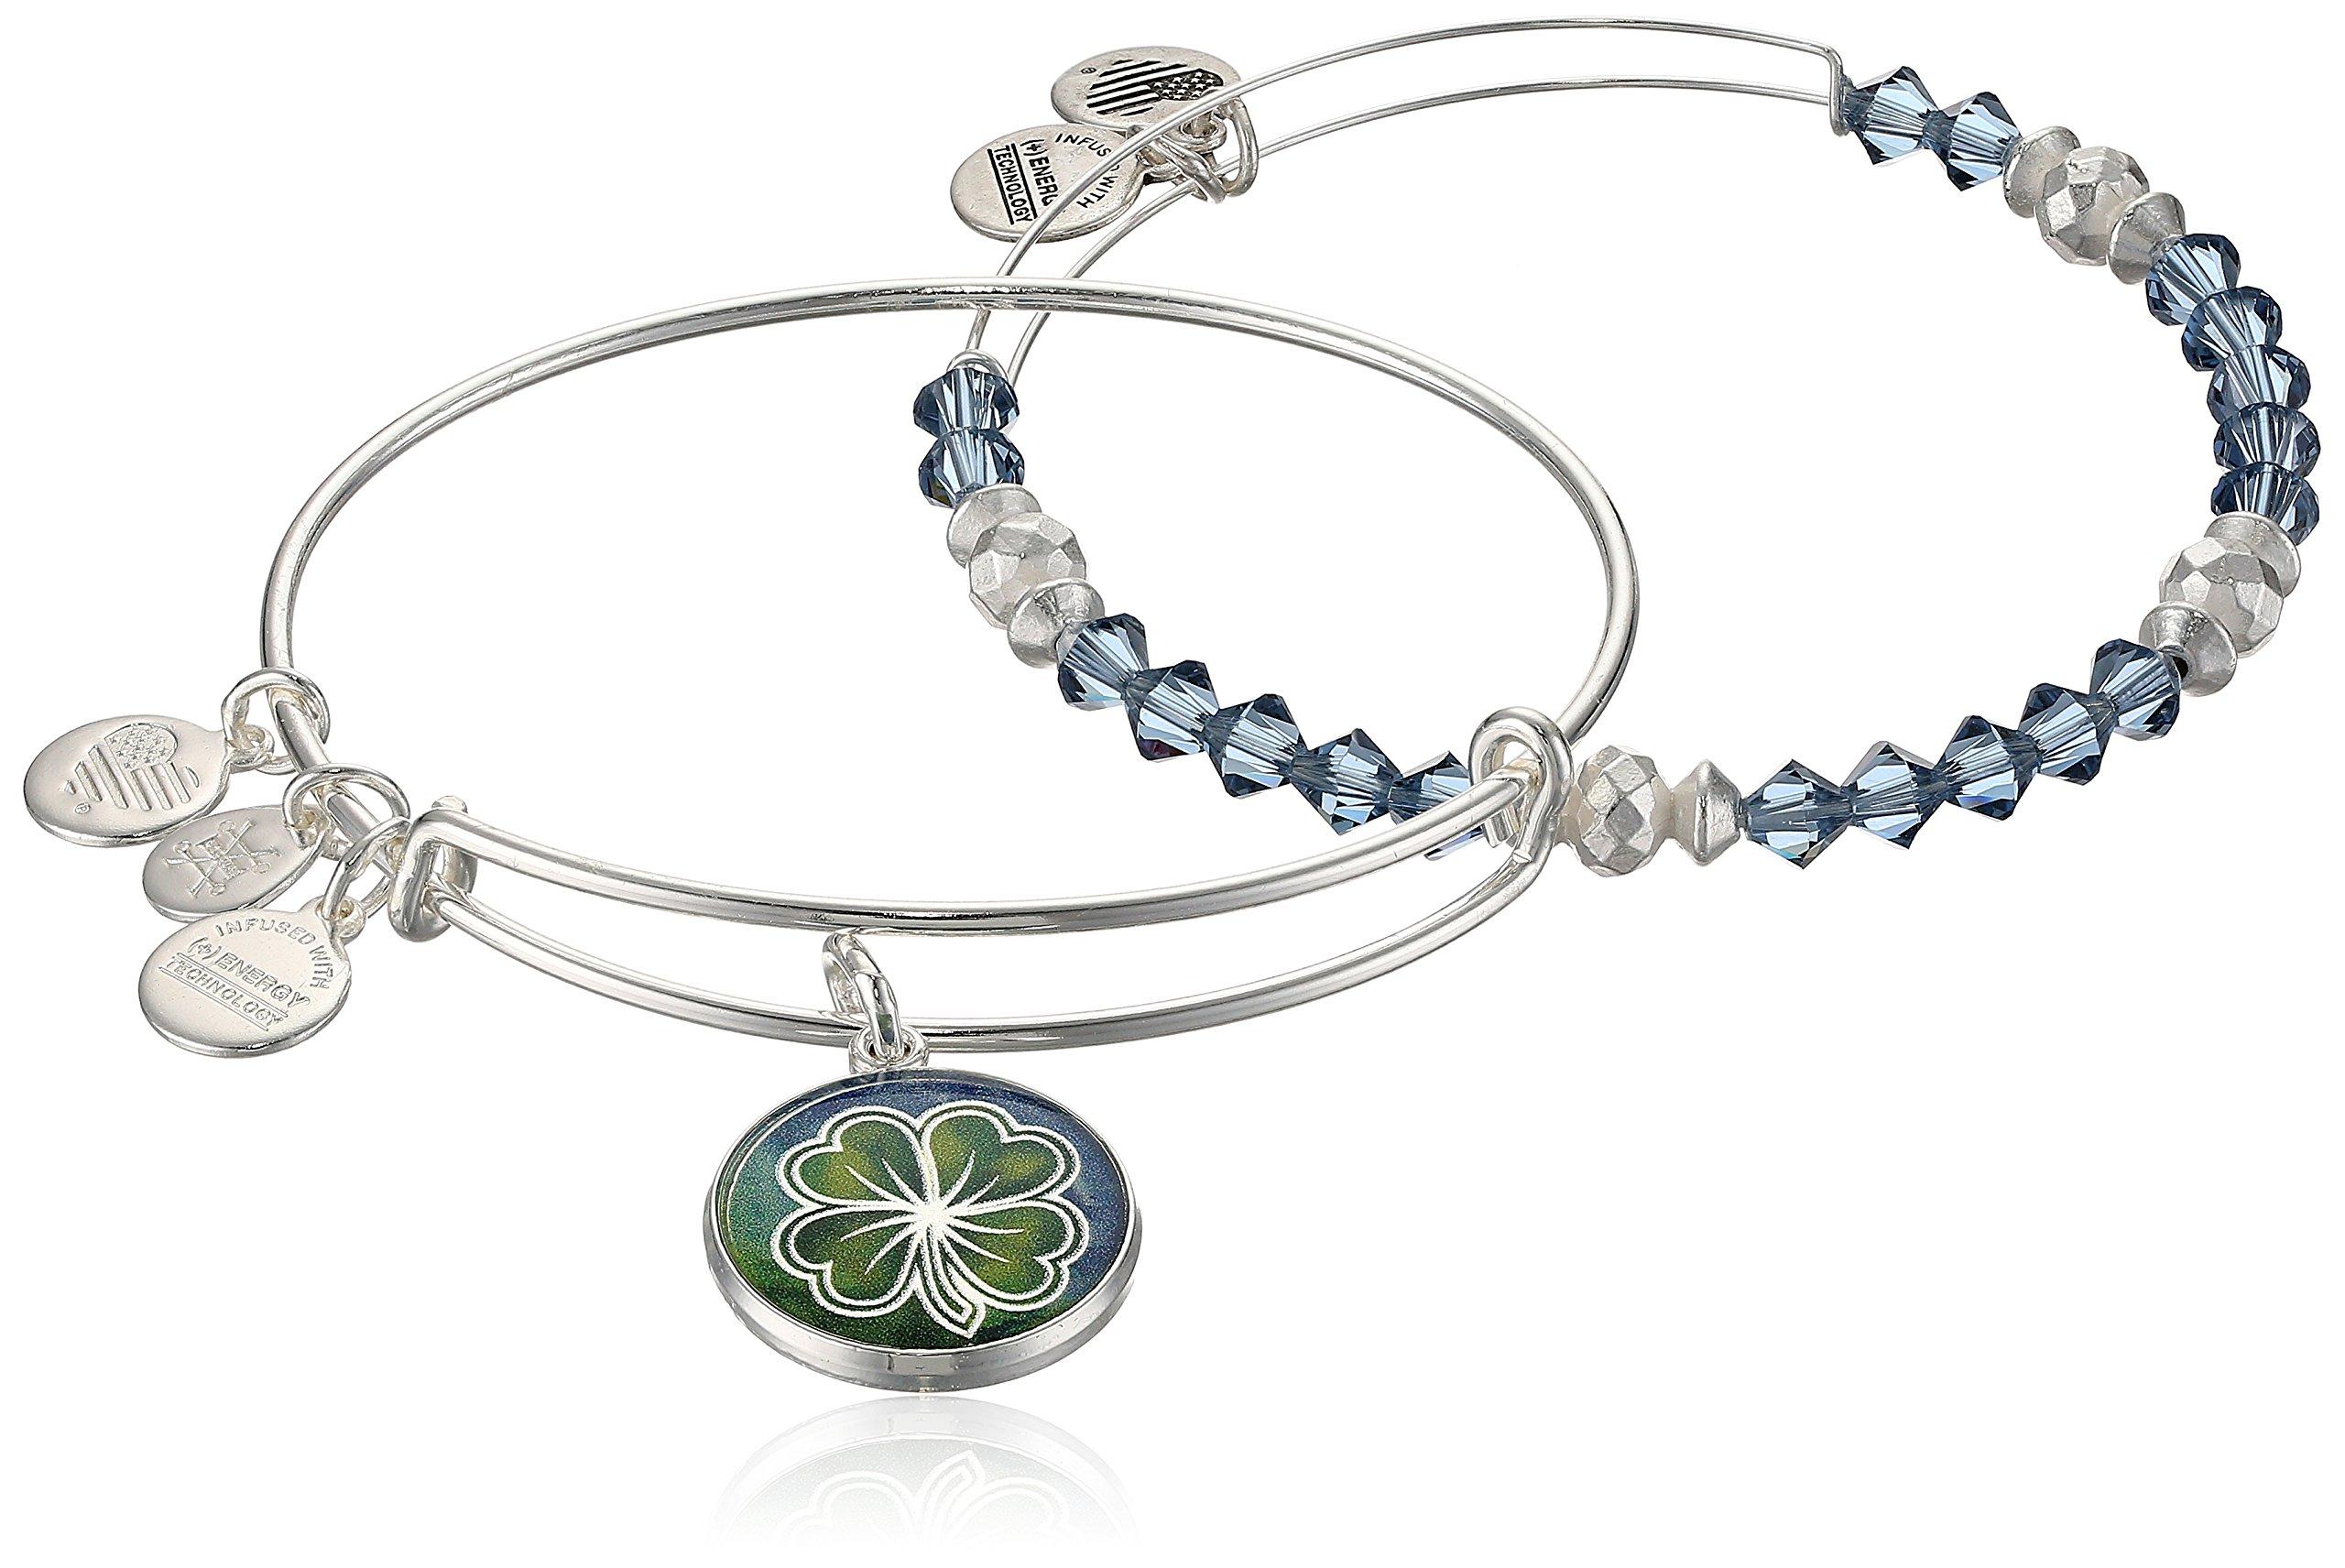 Alex and Ani Women's Art Infusion Set Four Leaf Clover Bangle Bracelet, Shiny Silver, Expandable